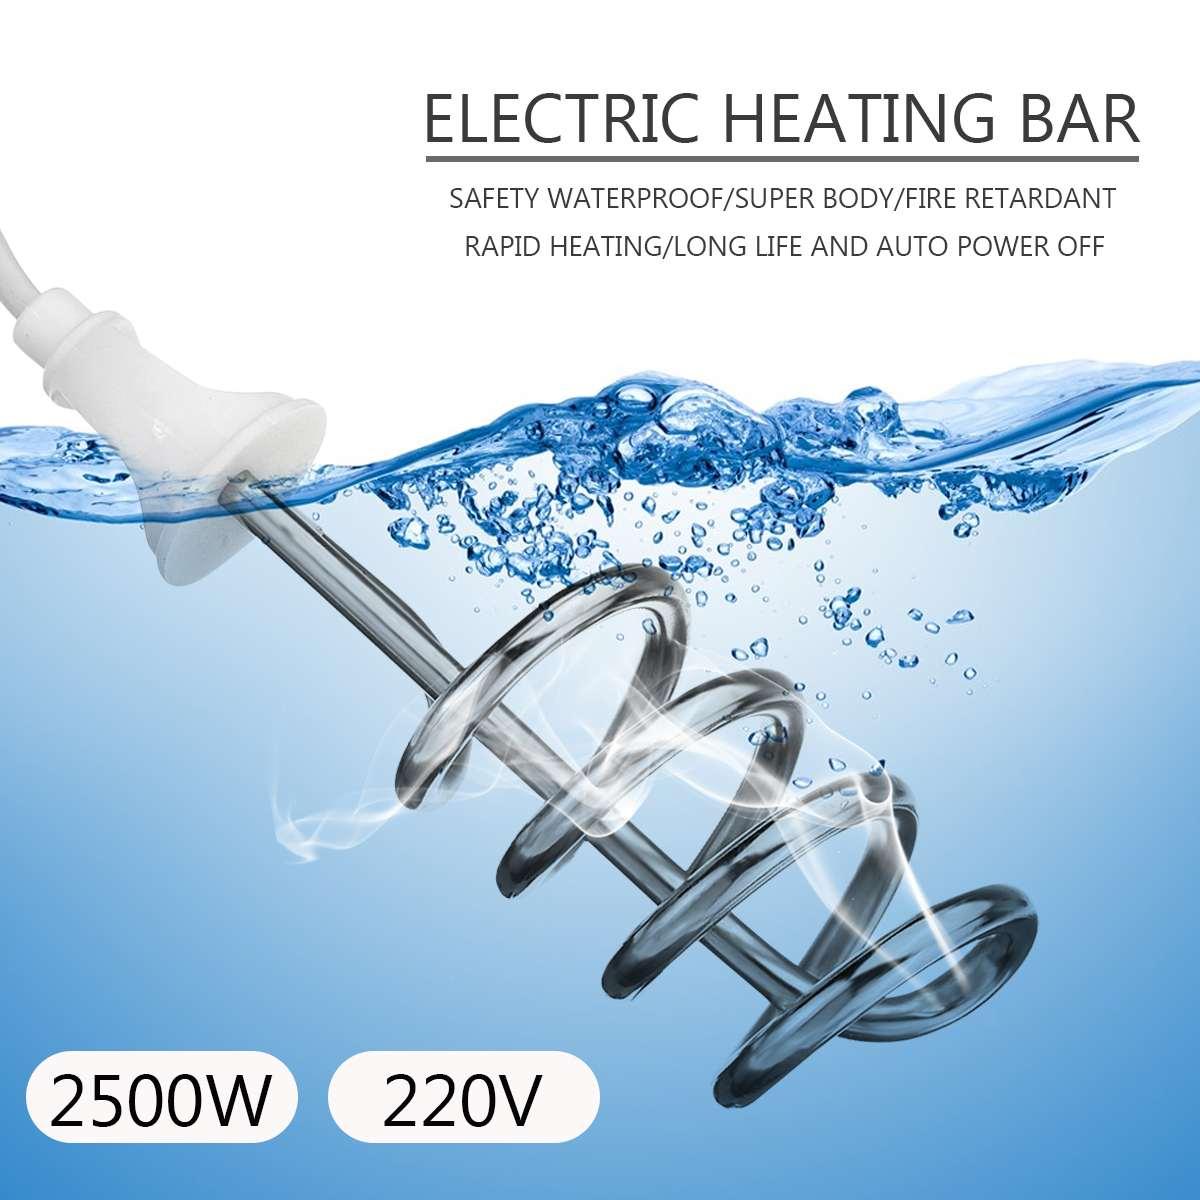 Calentadores Para Cuartos De Bano.2500 W 220 V Tipo De Gancho Calentador De Agua Portatil De